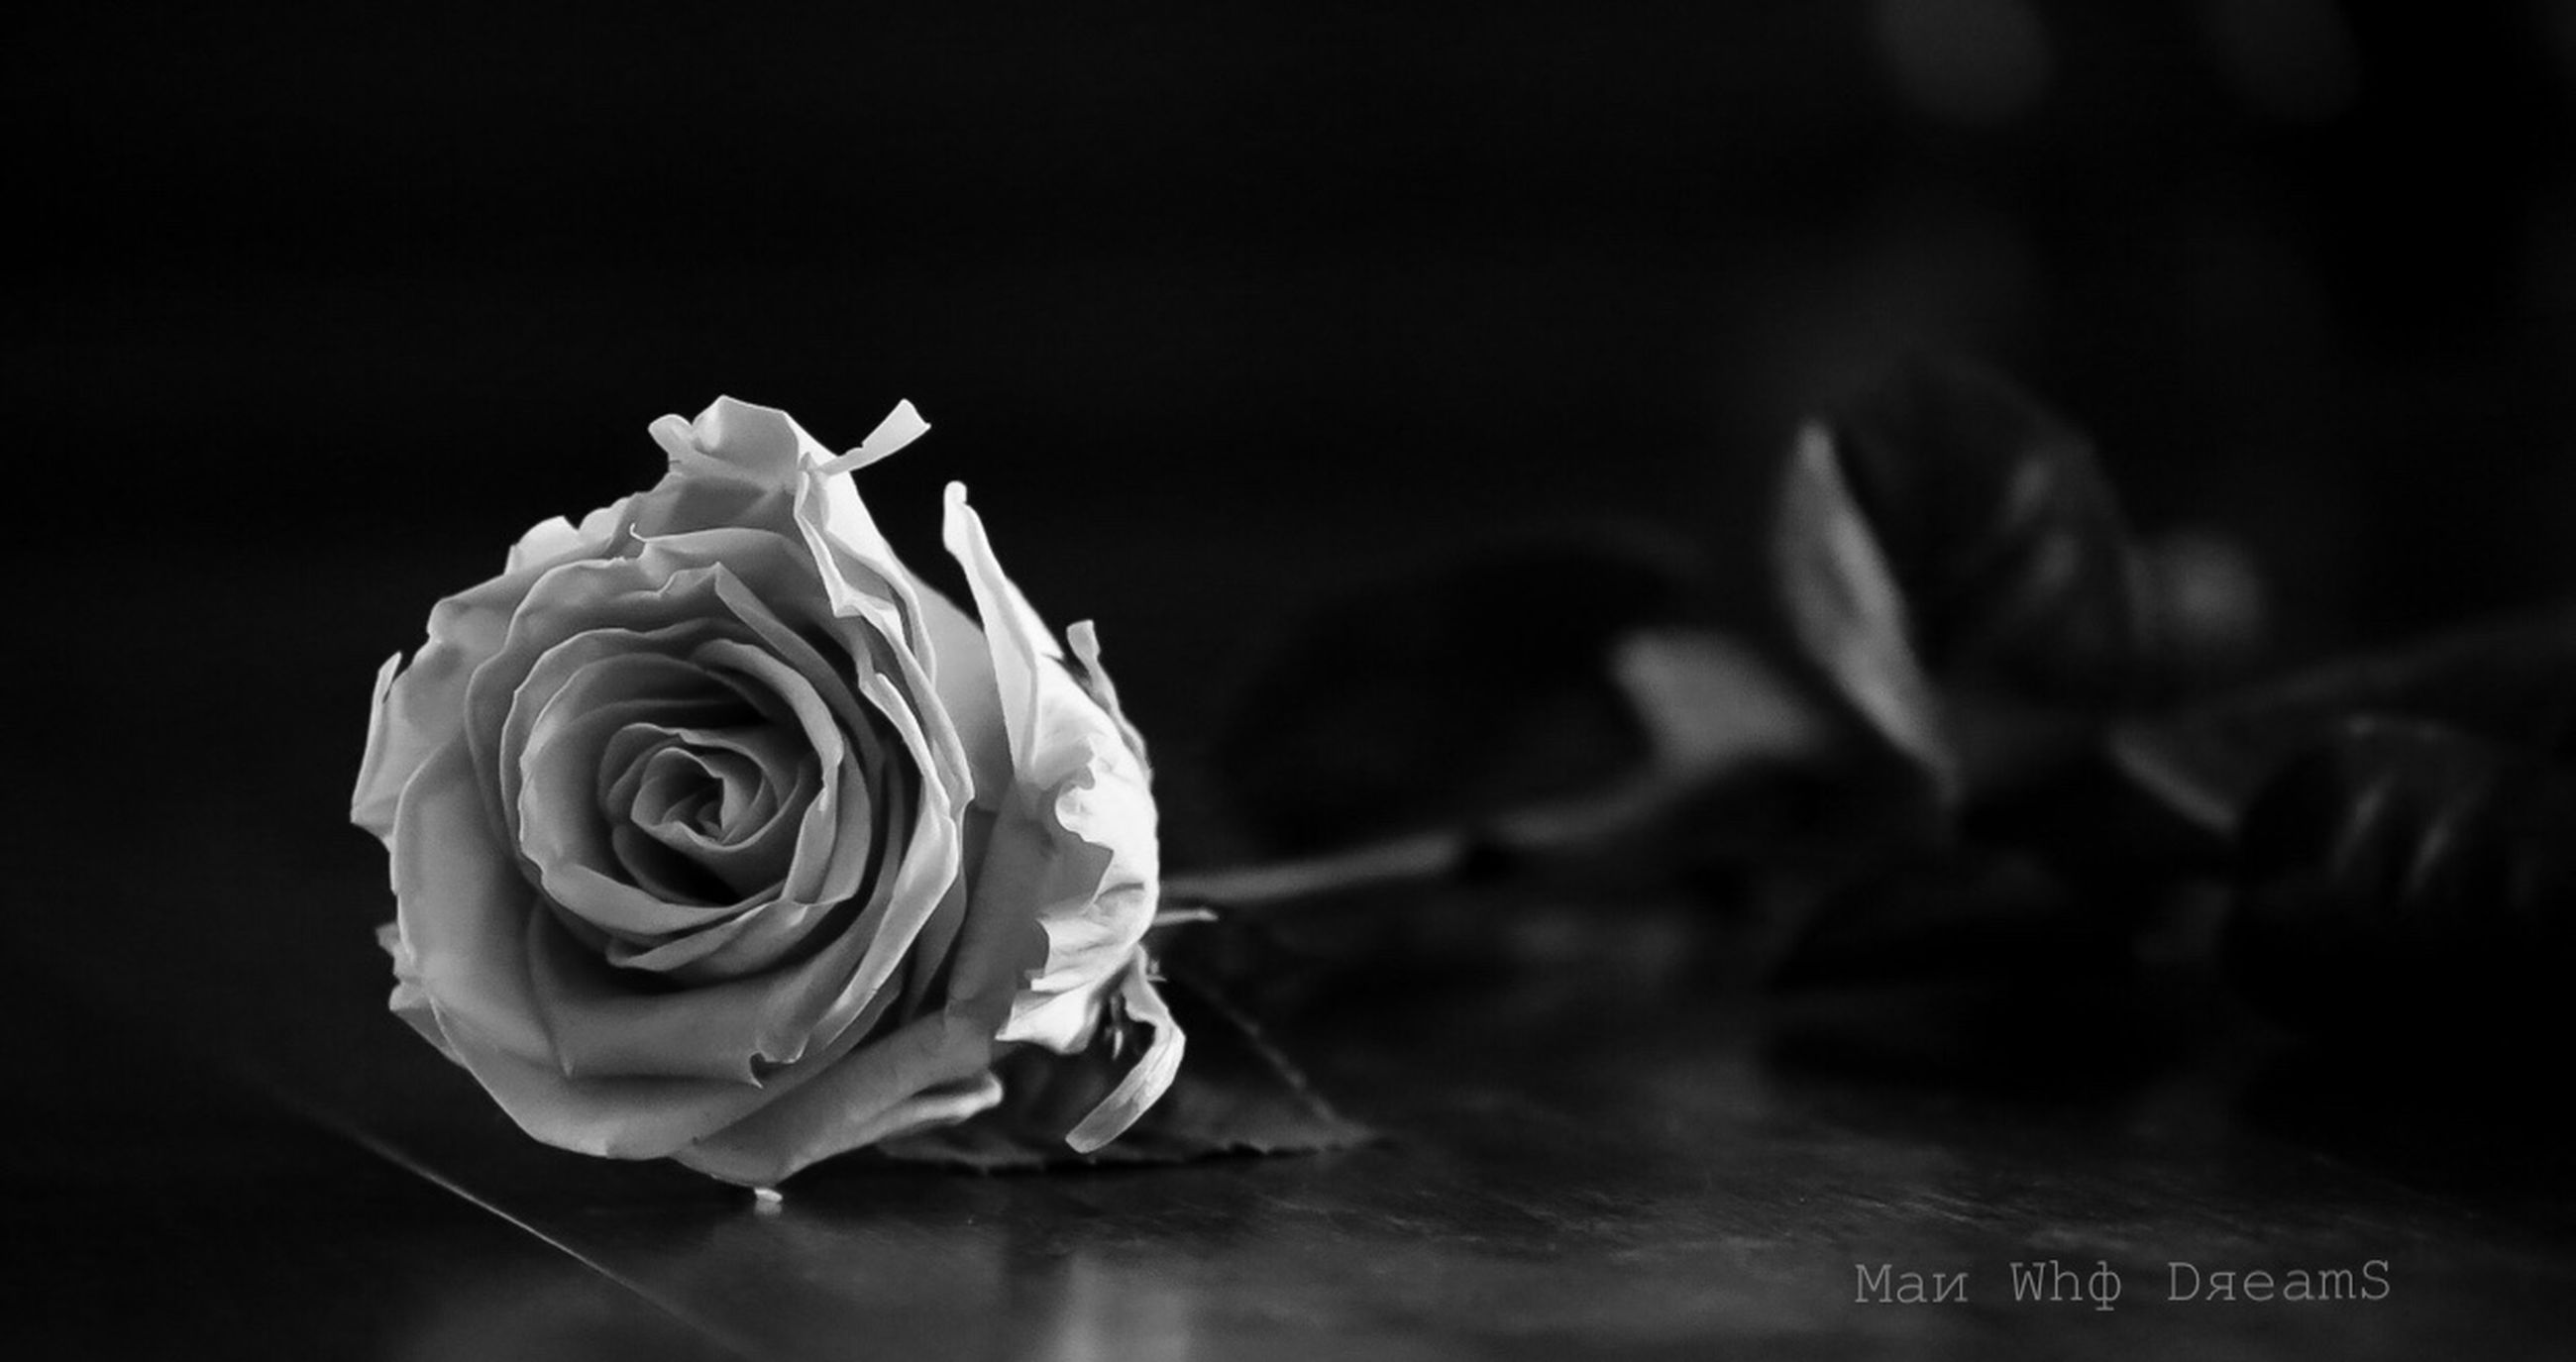 rose, rose - flower, flower, freshness, beauty in nature, flowering plant, close-up, plant, vulnerability, petal, fragility, flower head, inflorescence, nature, no people, indoors, table, leaf, selective focus, black background, bouquet, flower arrangement